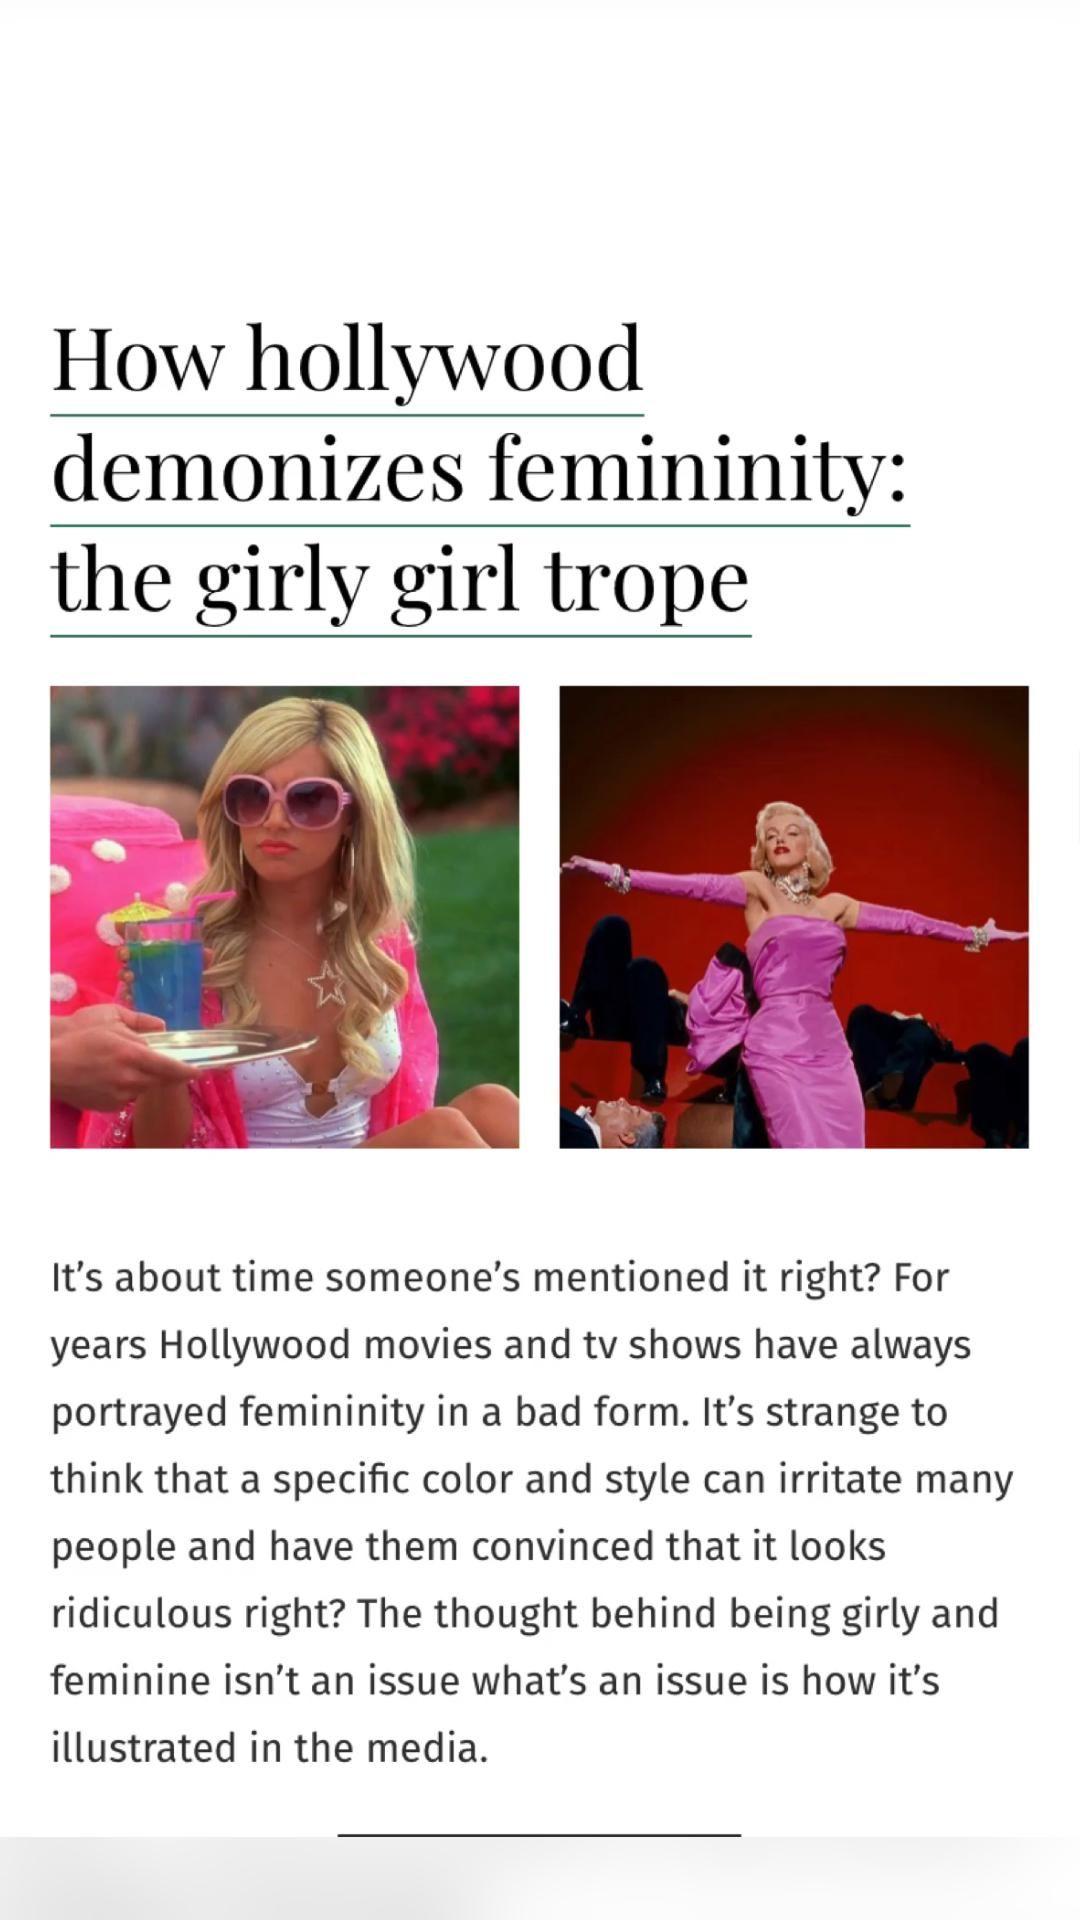 How Hollywood demonizes femininity: